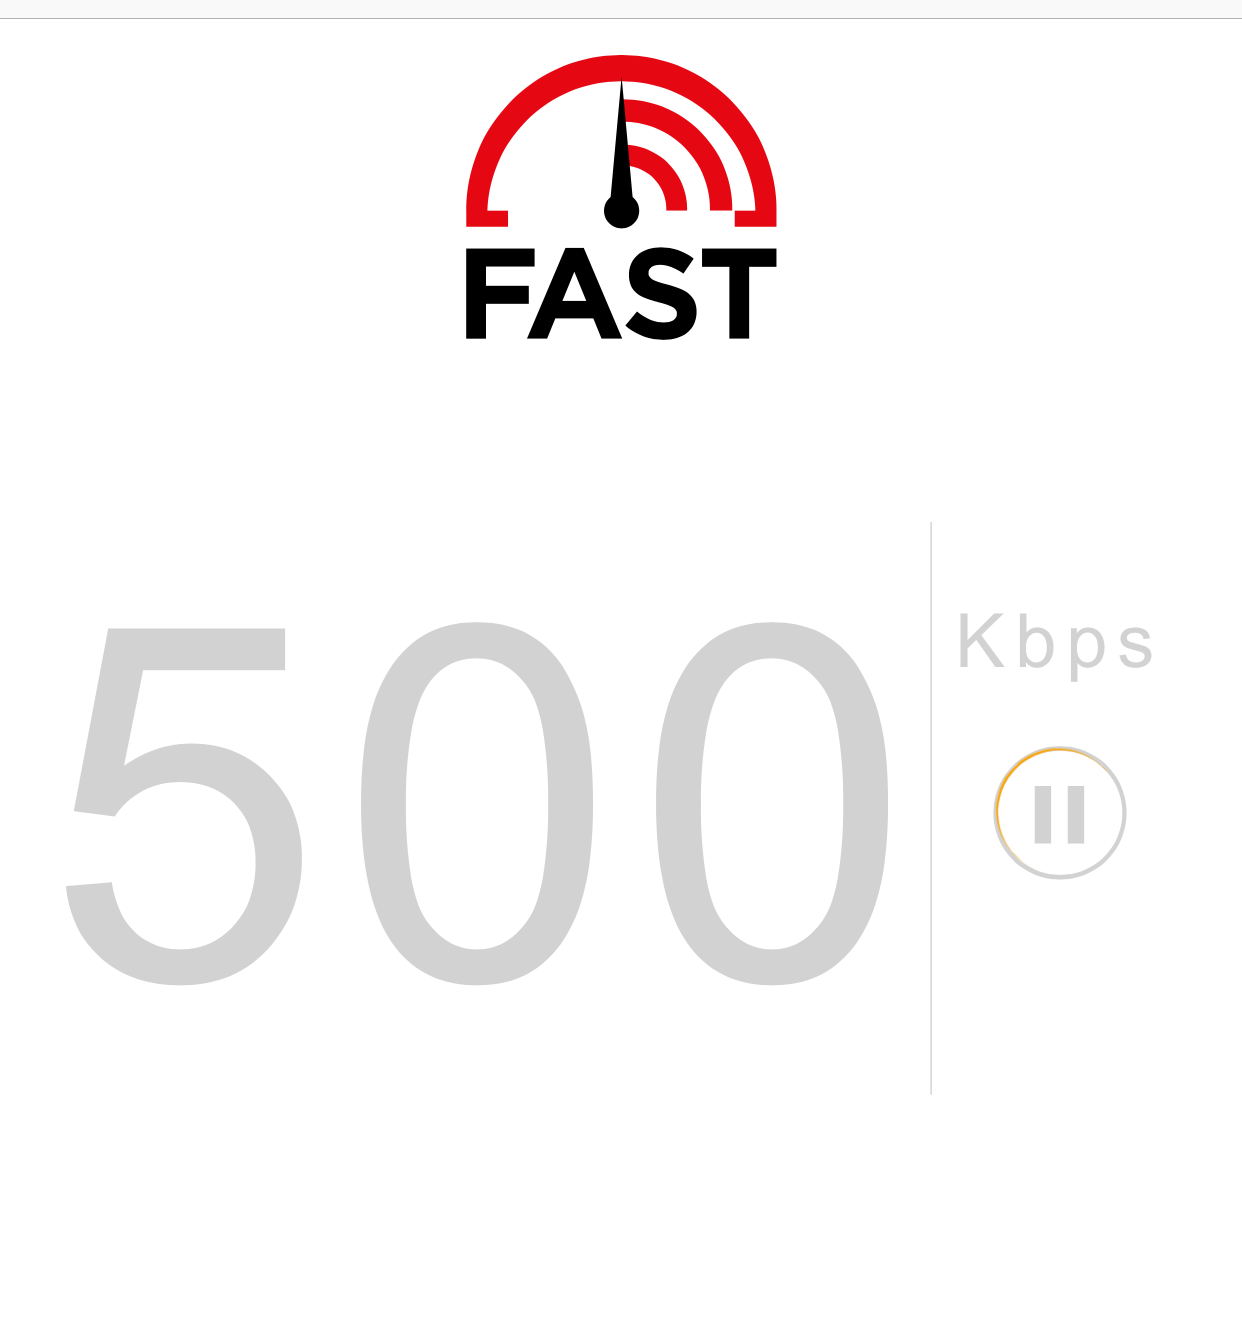 iPhone Speed Via Fast.com